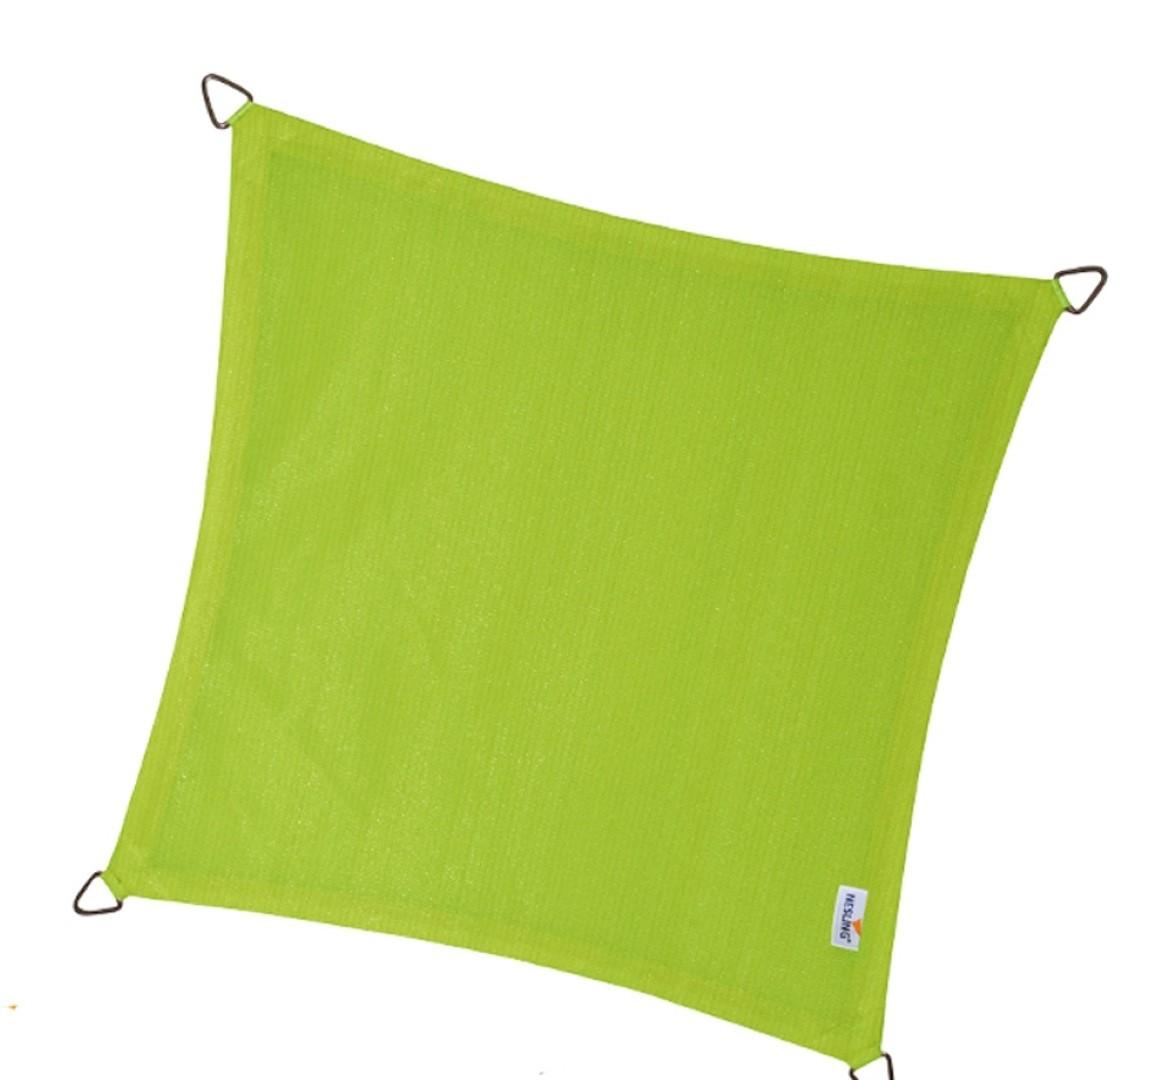 Vierkant 5,0 x 5,0 x 5,0 x 5,0m, Lime Groen